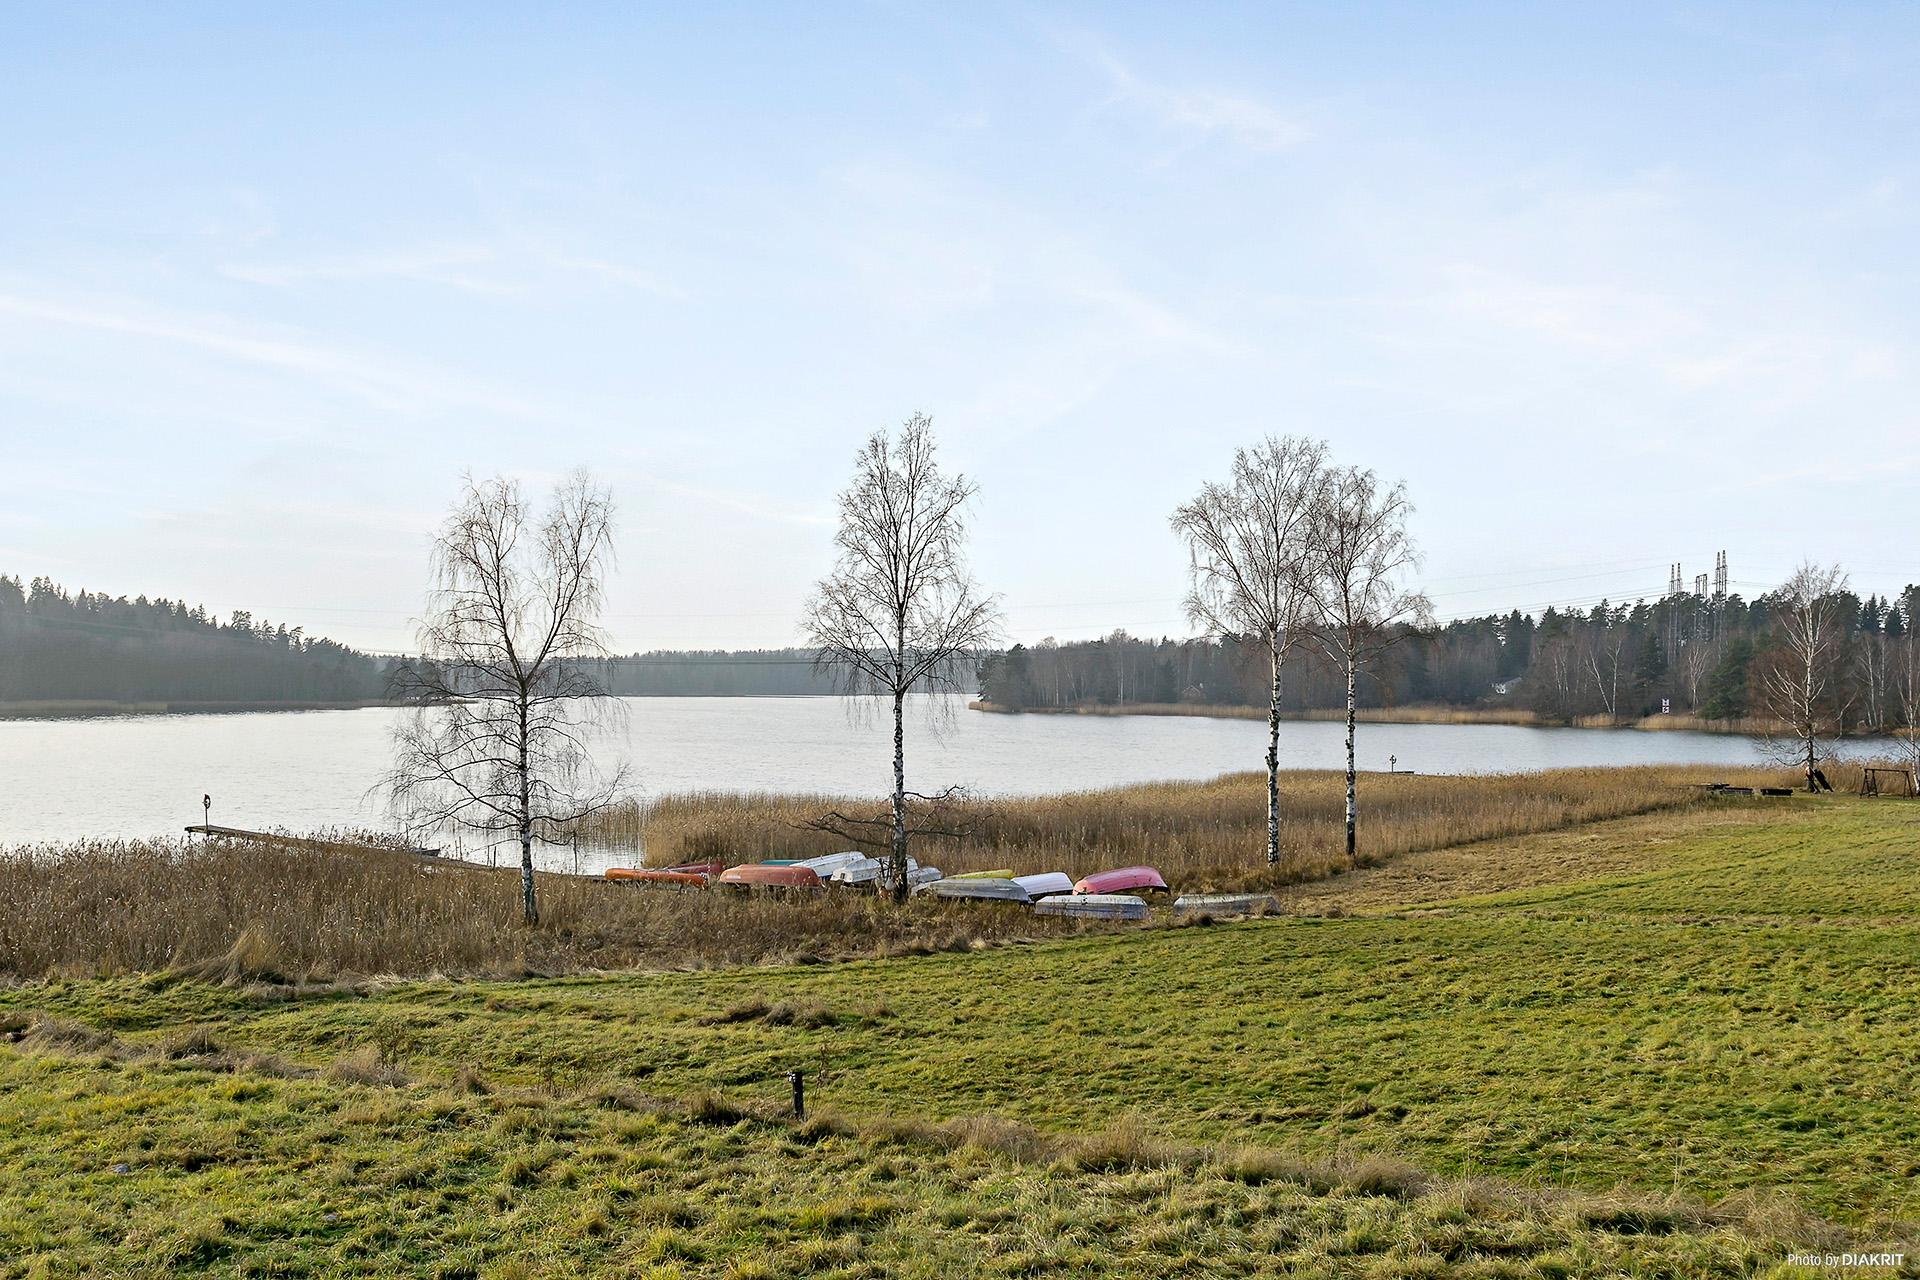 Lejondalssjöns båtplats